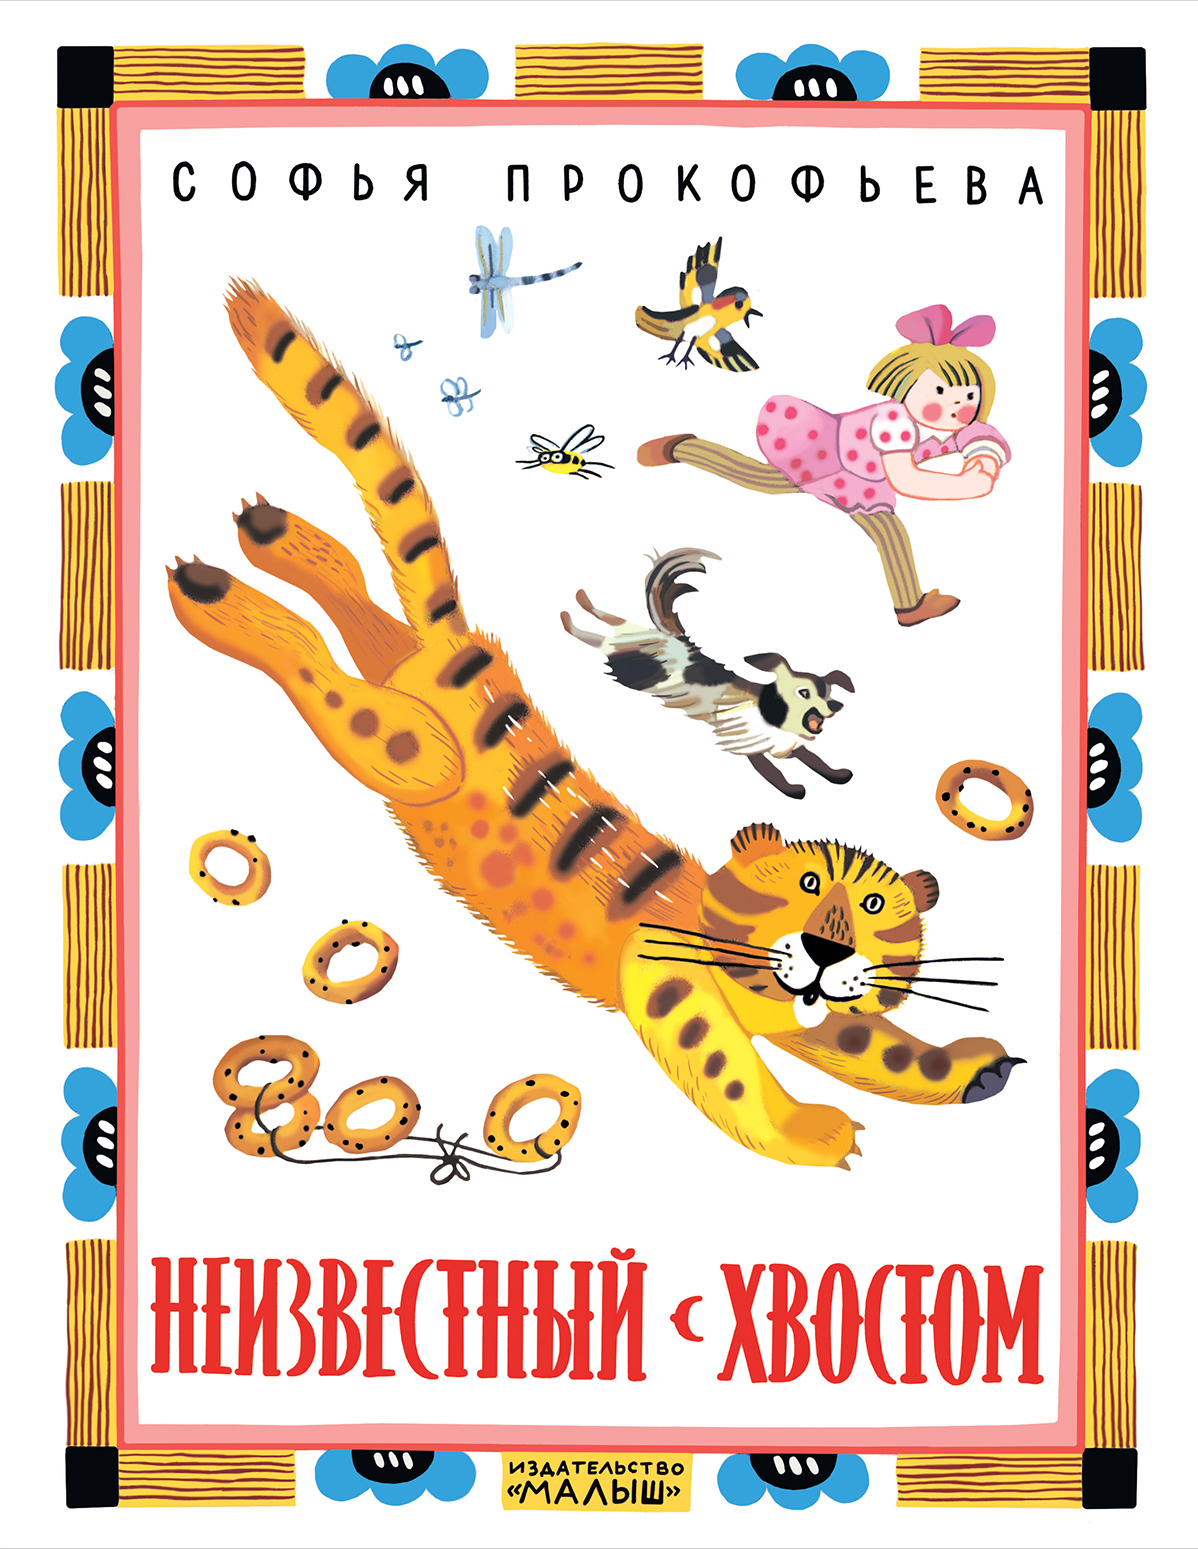 Прокофьева С. Л. Неизвестный с хвостом прокофьева с л неизвестный с хвостом